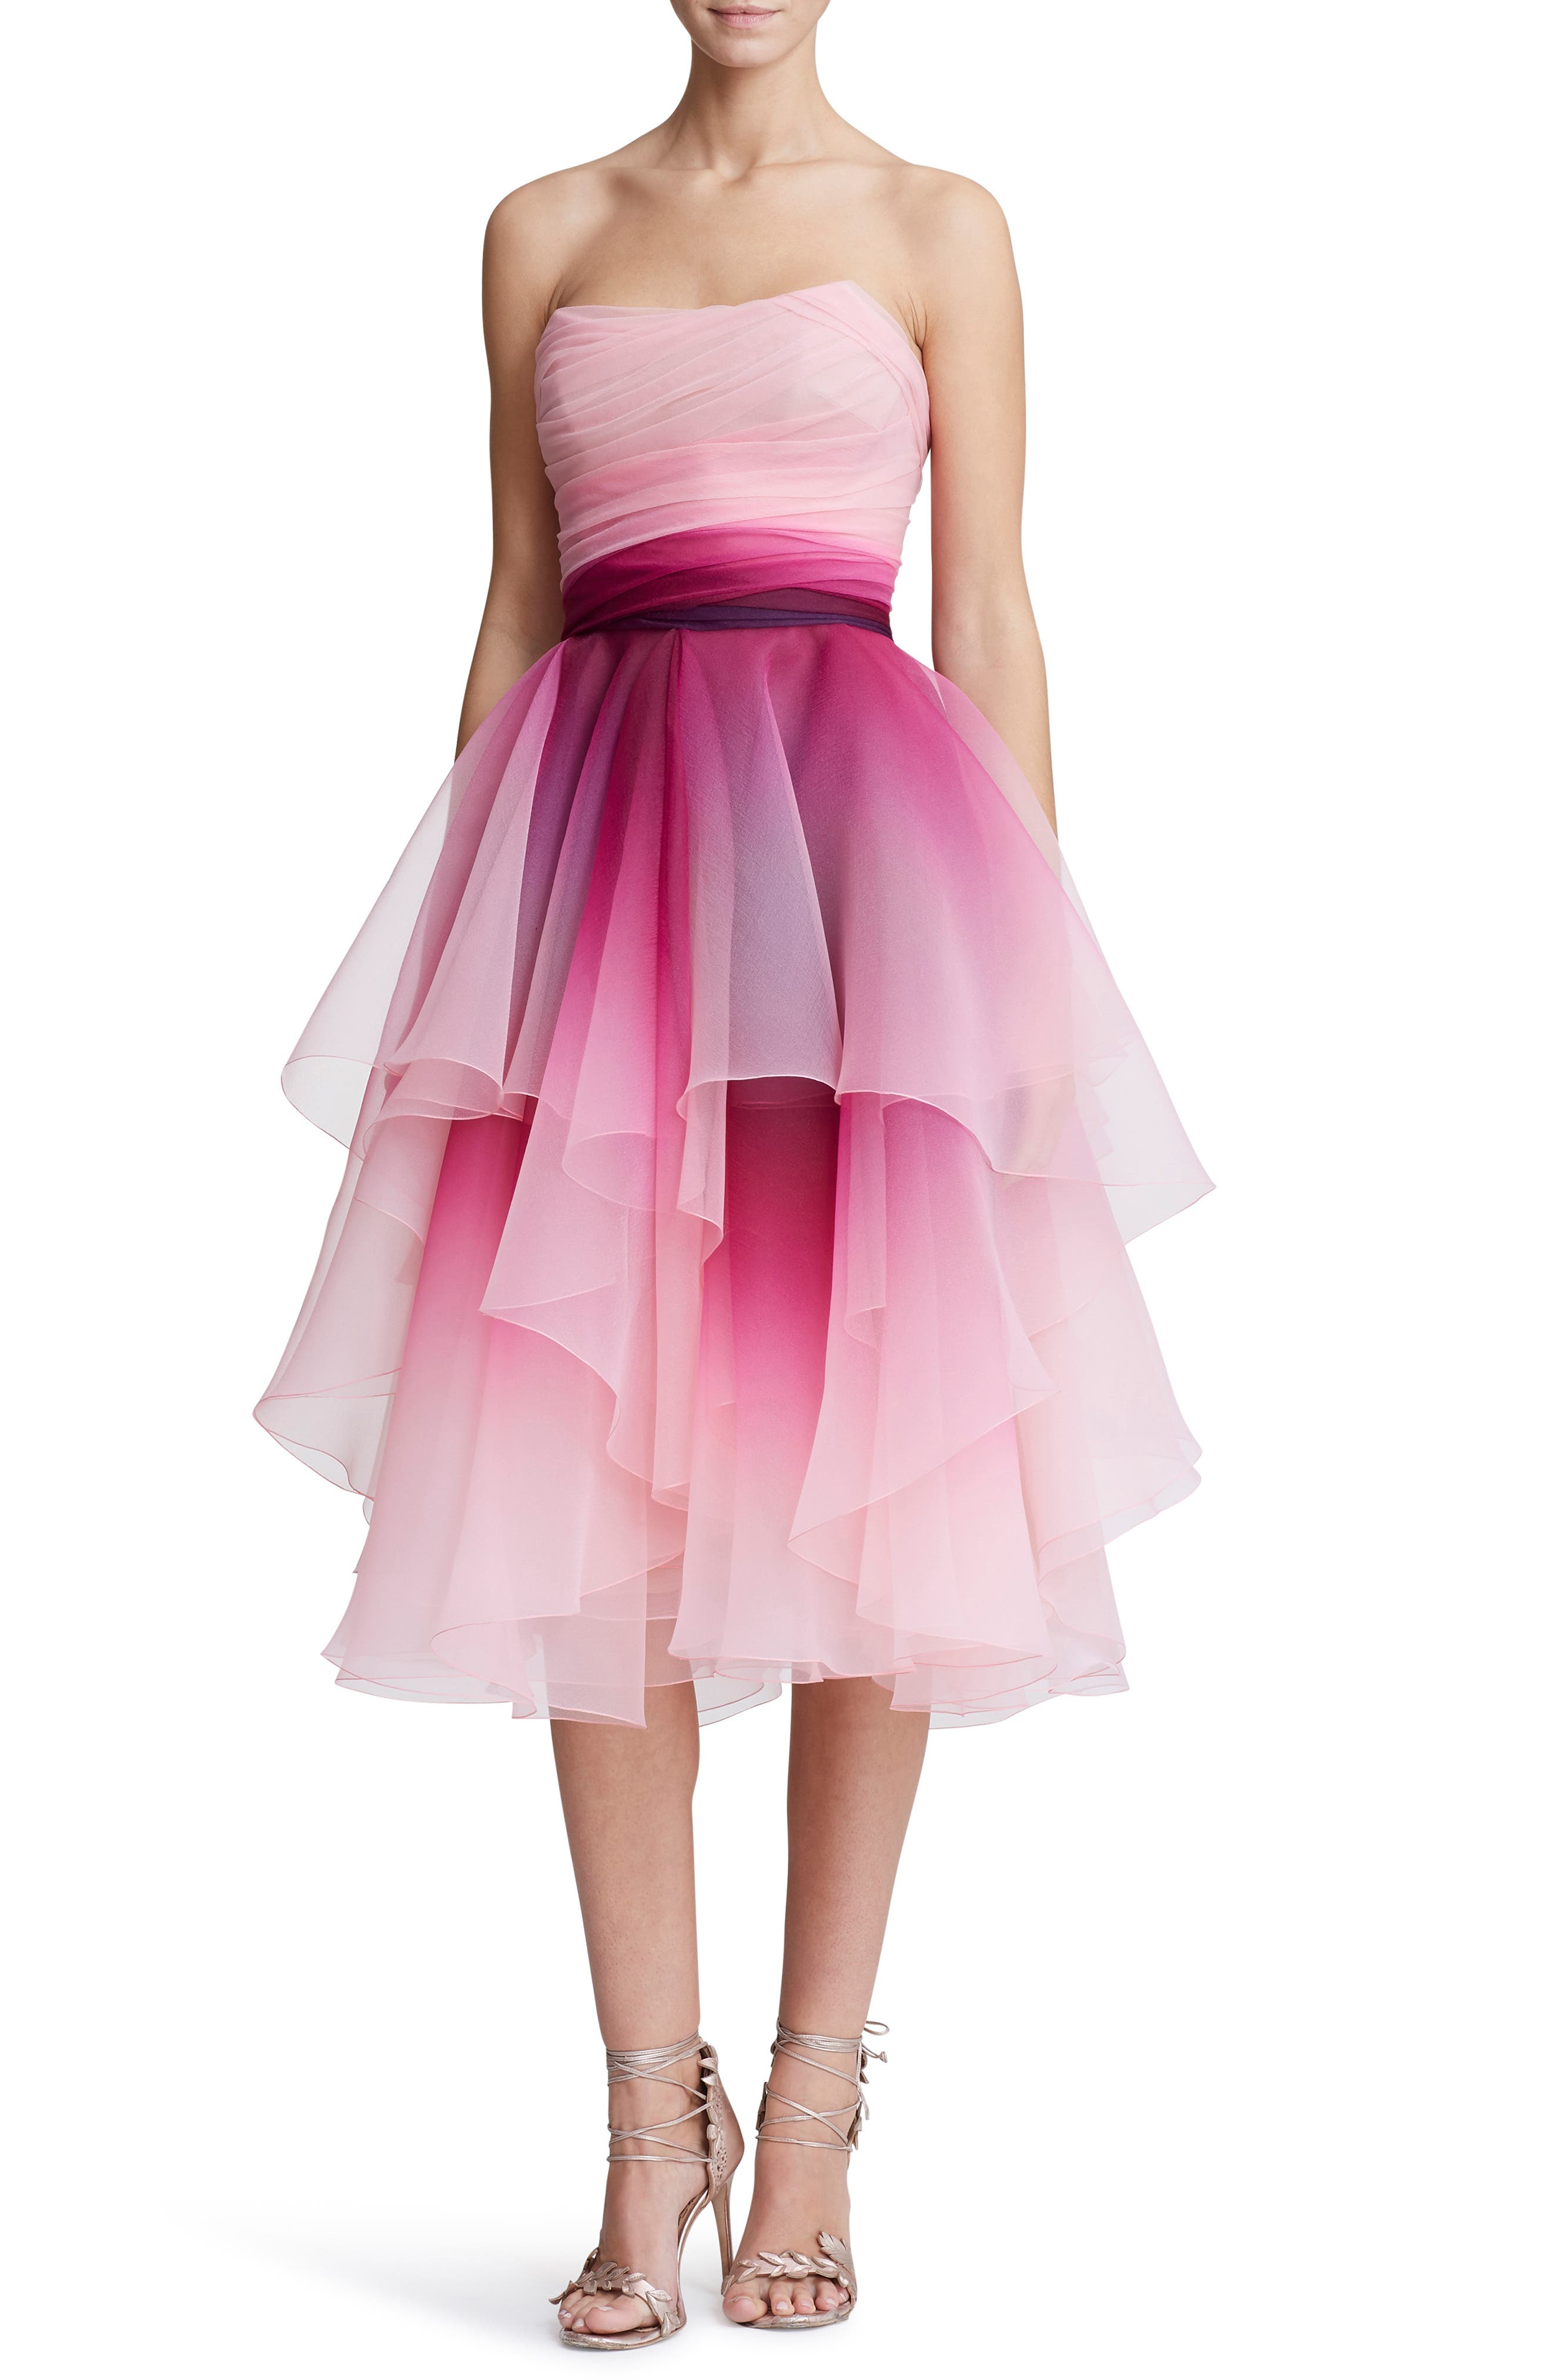 Marchesa Strapless Ombre Organza Cocktail Dress, Pink